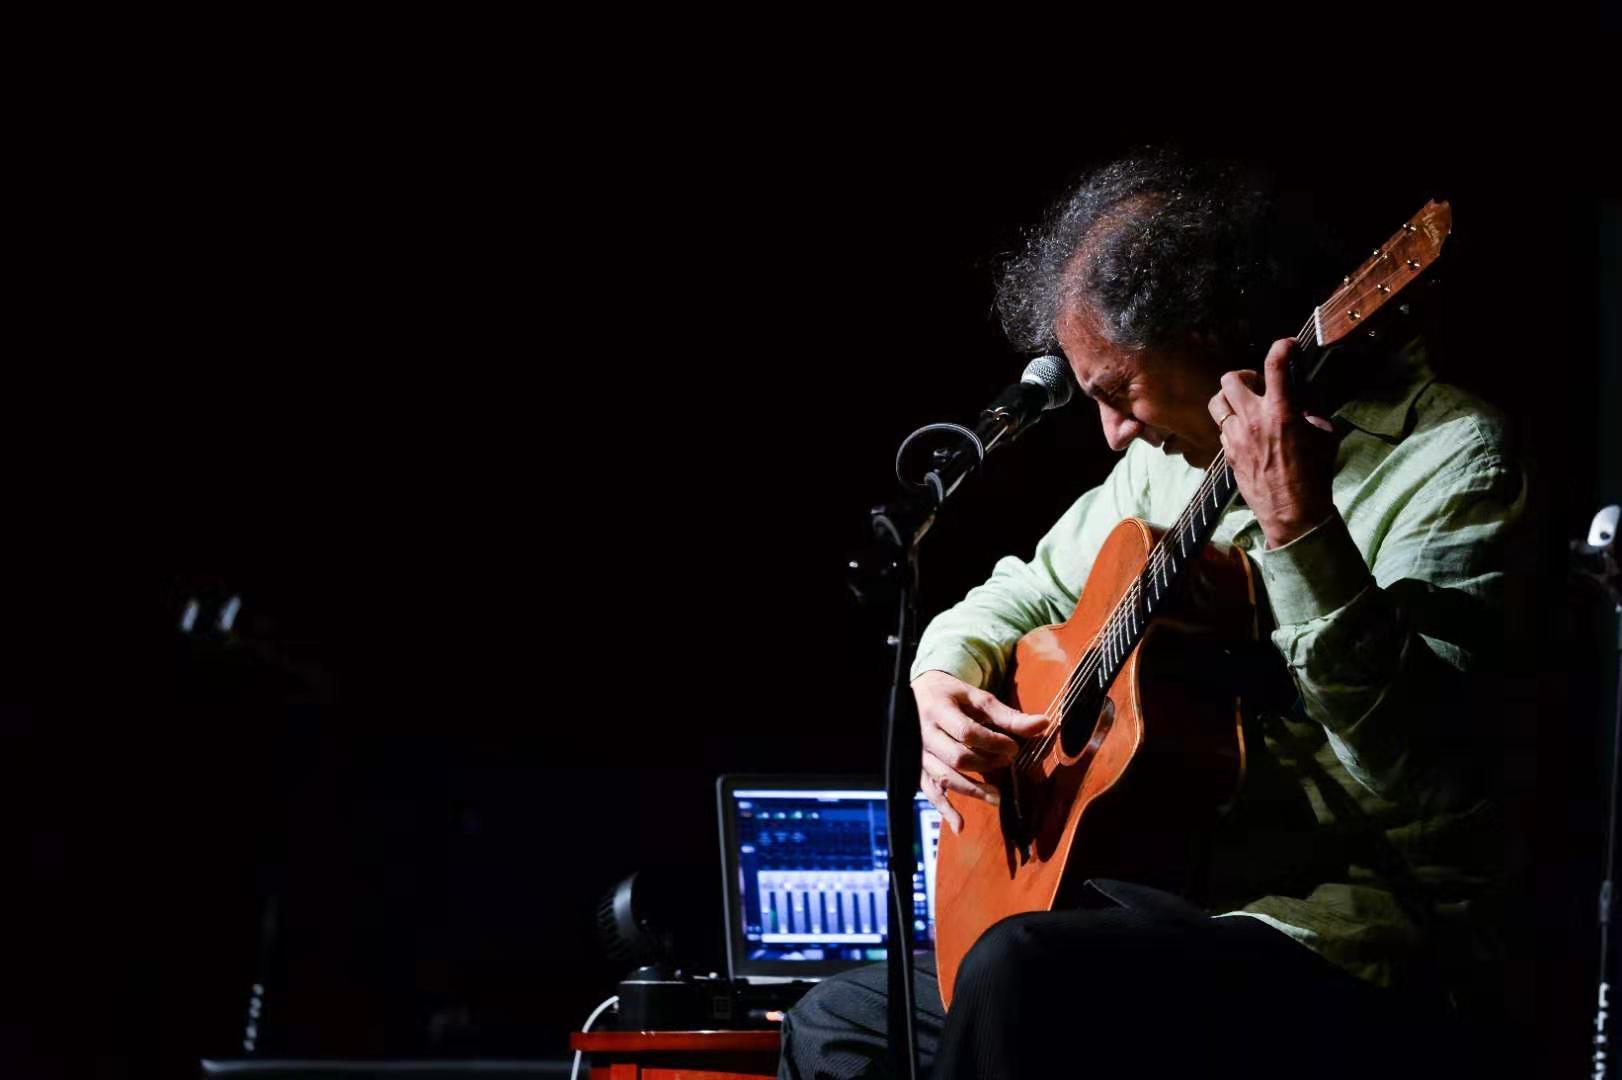 Pierre Bensusan 7月17日青岛专场吉他音乐会圆满收官